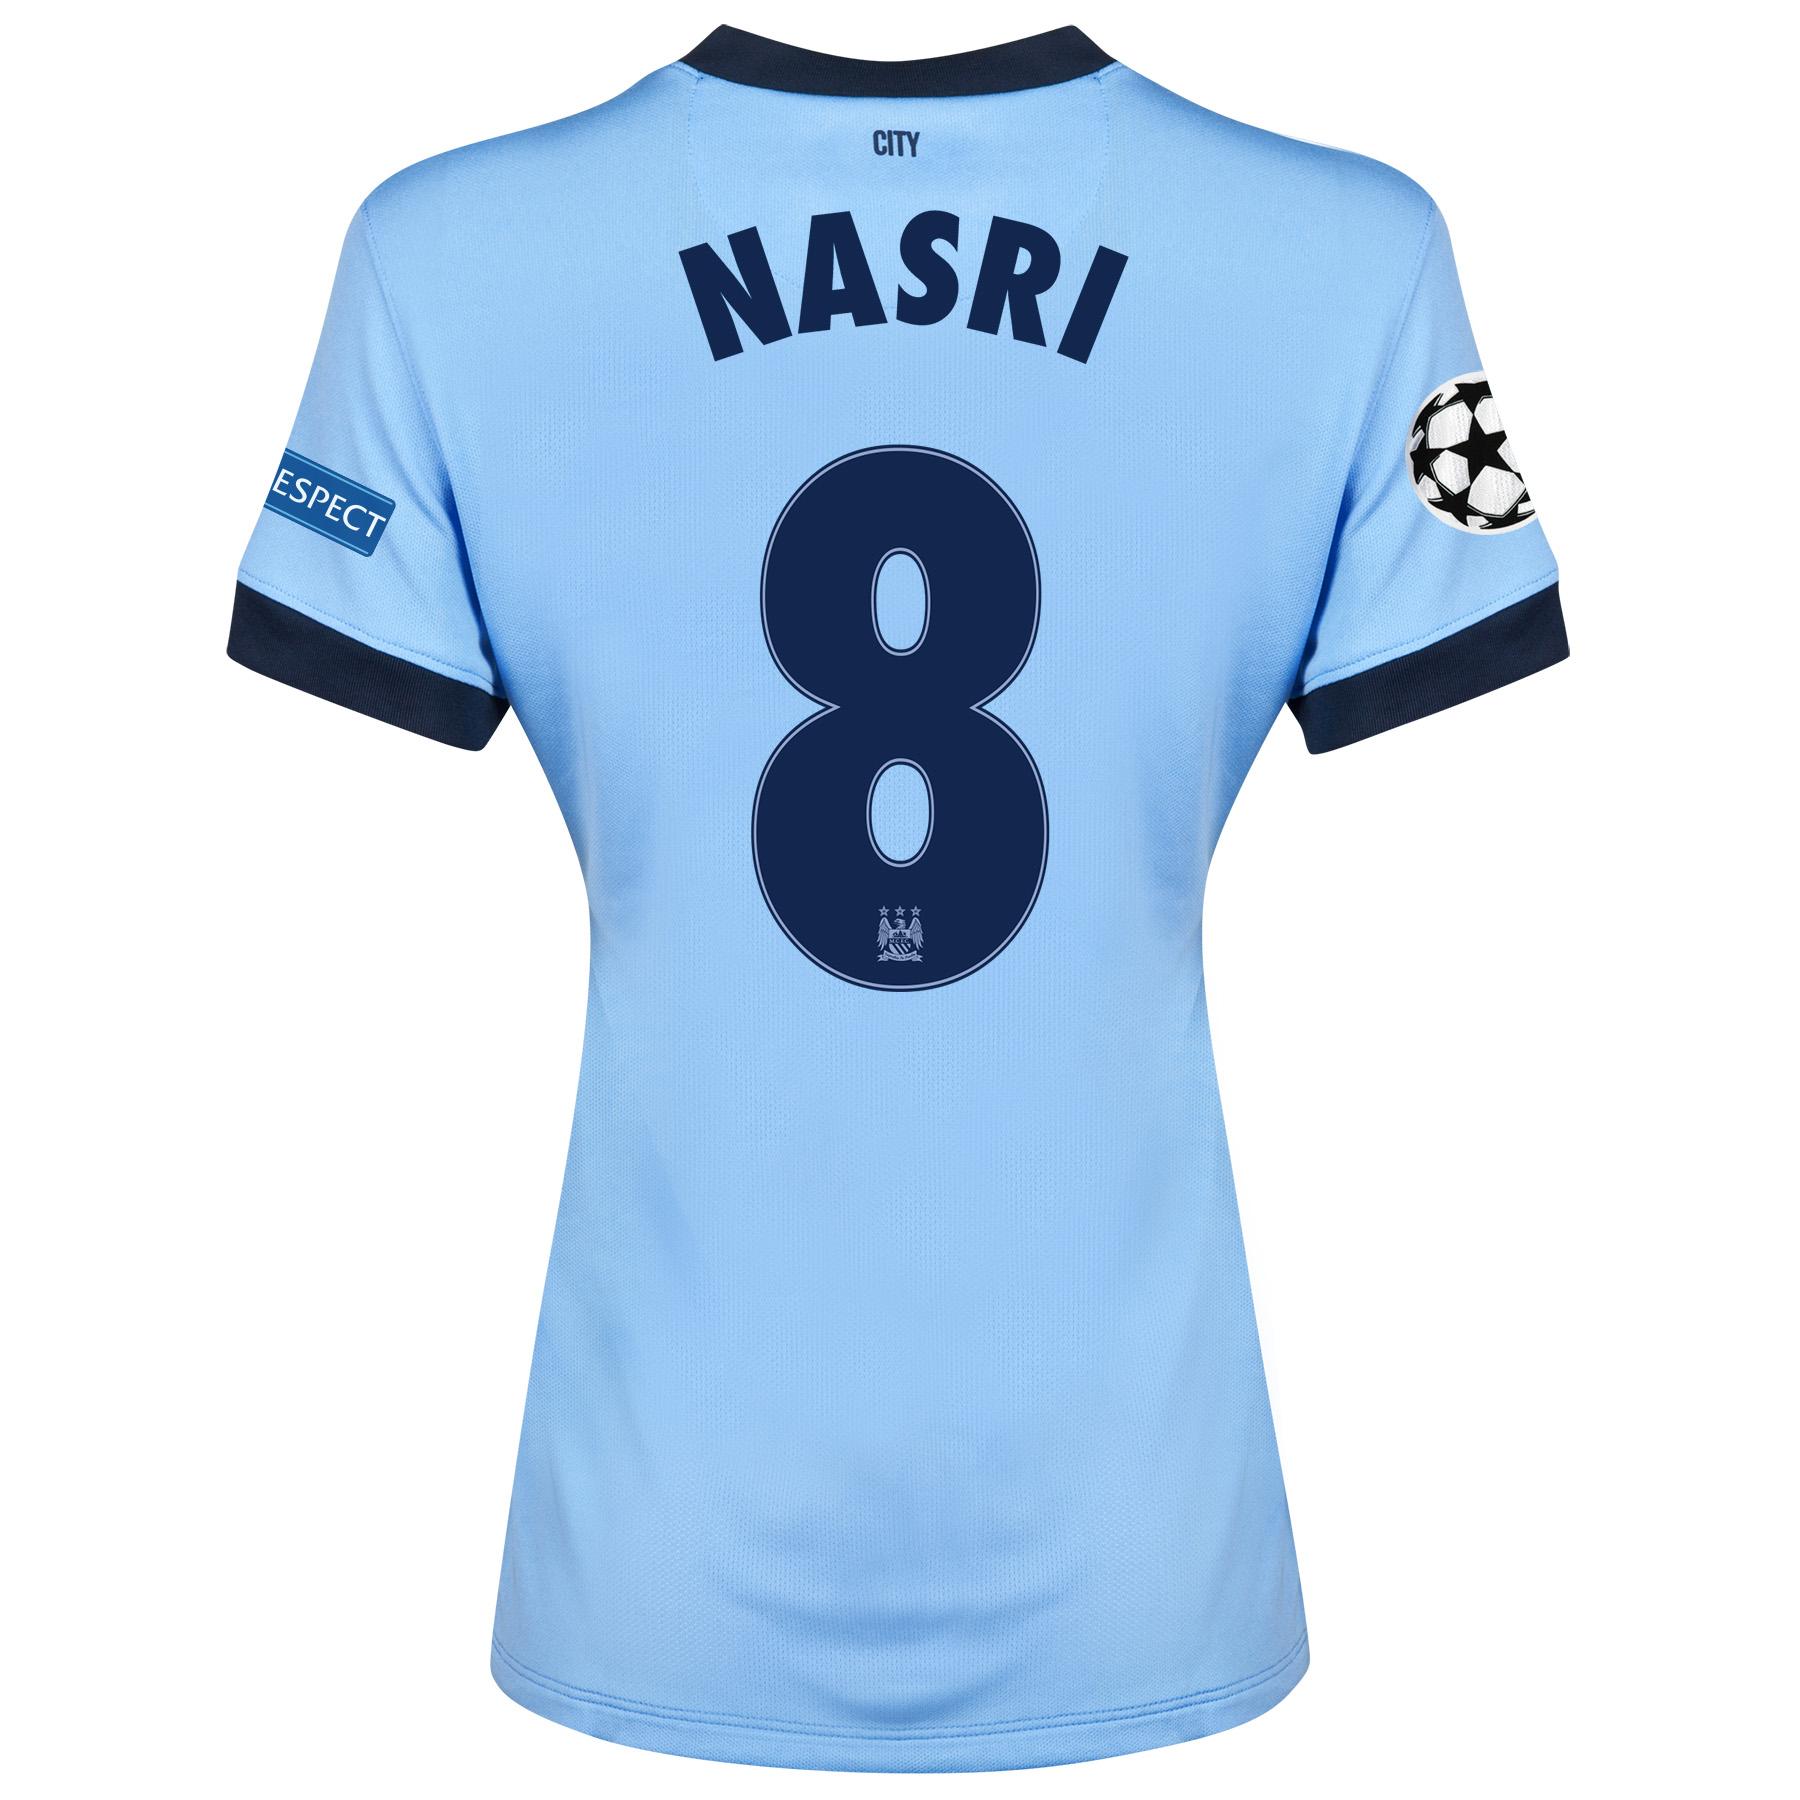 Manchester City UEFA Champions League Home Shirt 2014/15 - Womens Sky Blue with Nasri 8 printing